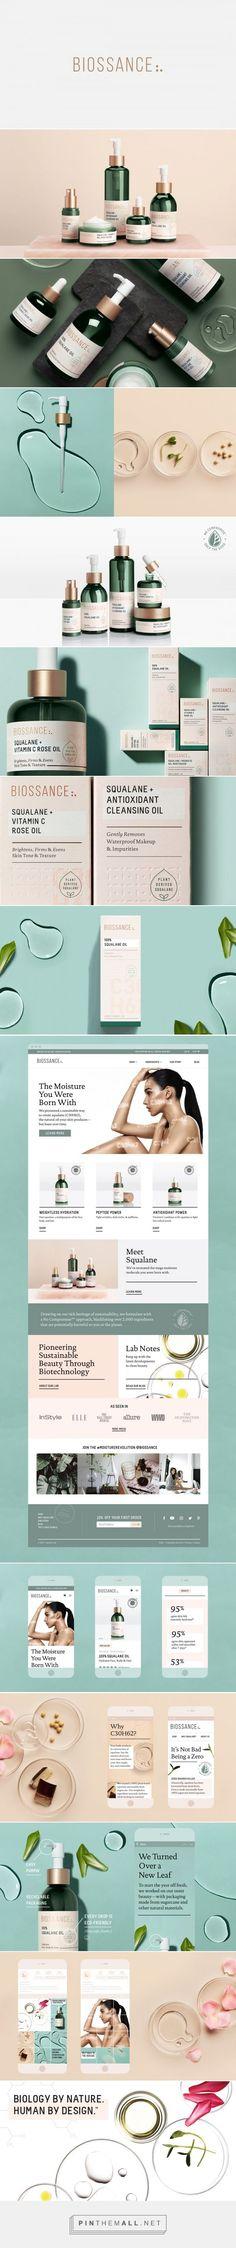 Biossance Skincare Branding, Packaging, and Web Design by Bartlett Brands | Fivestar Branding Agency – Design and Branding Agency & Curated Inspiration Gallery